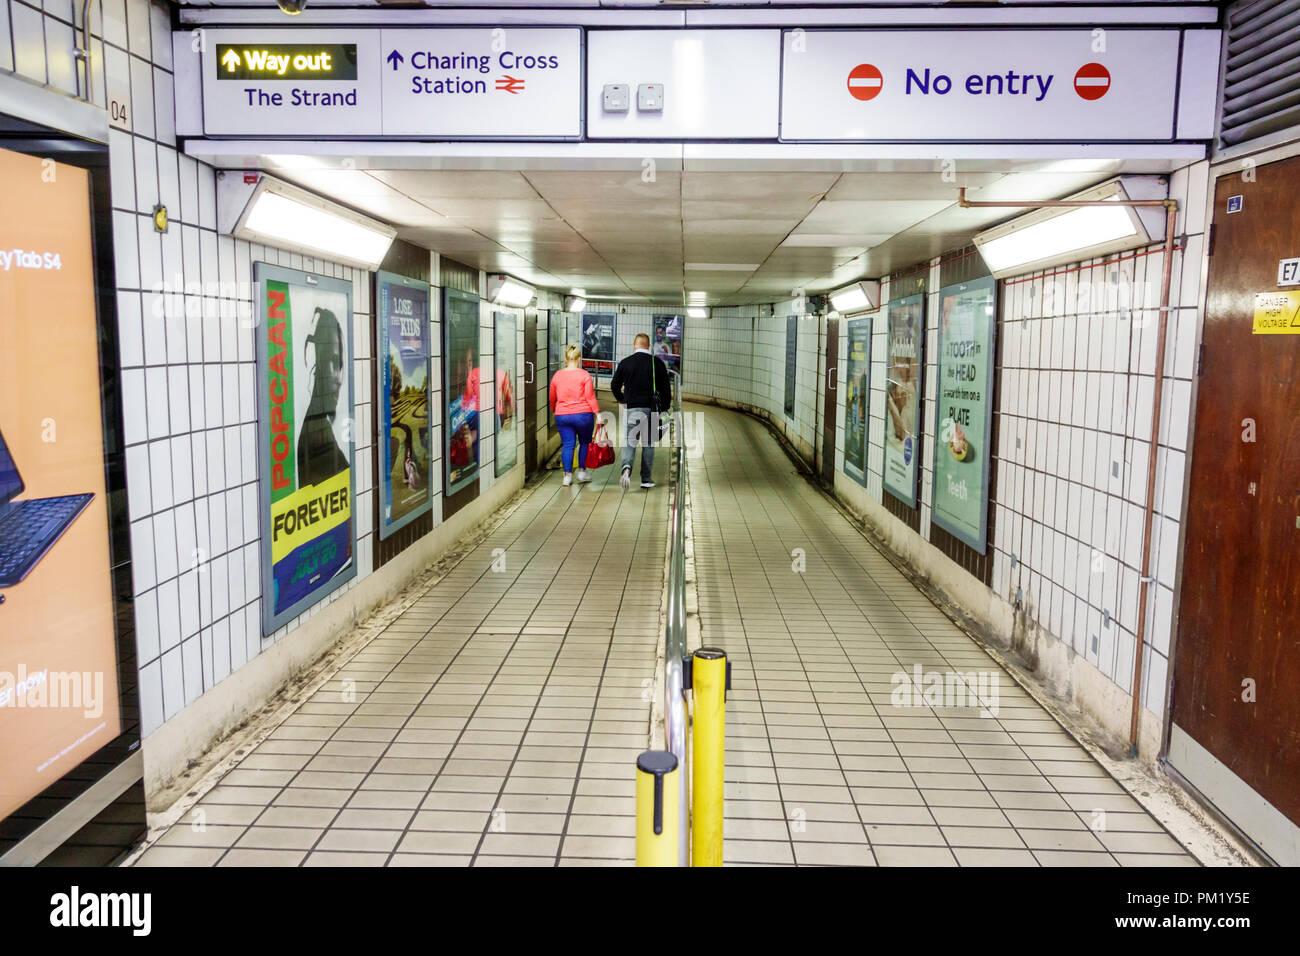 London England Great Britain United Kingdom Charing Cross Underground Station subway tube public transportation inside exit hallway sign advertisement - Stock Image